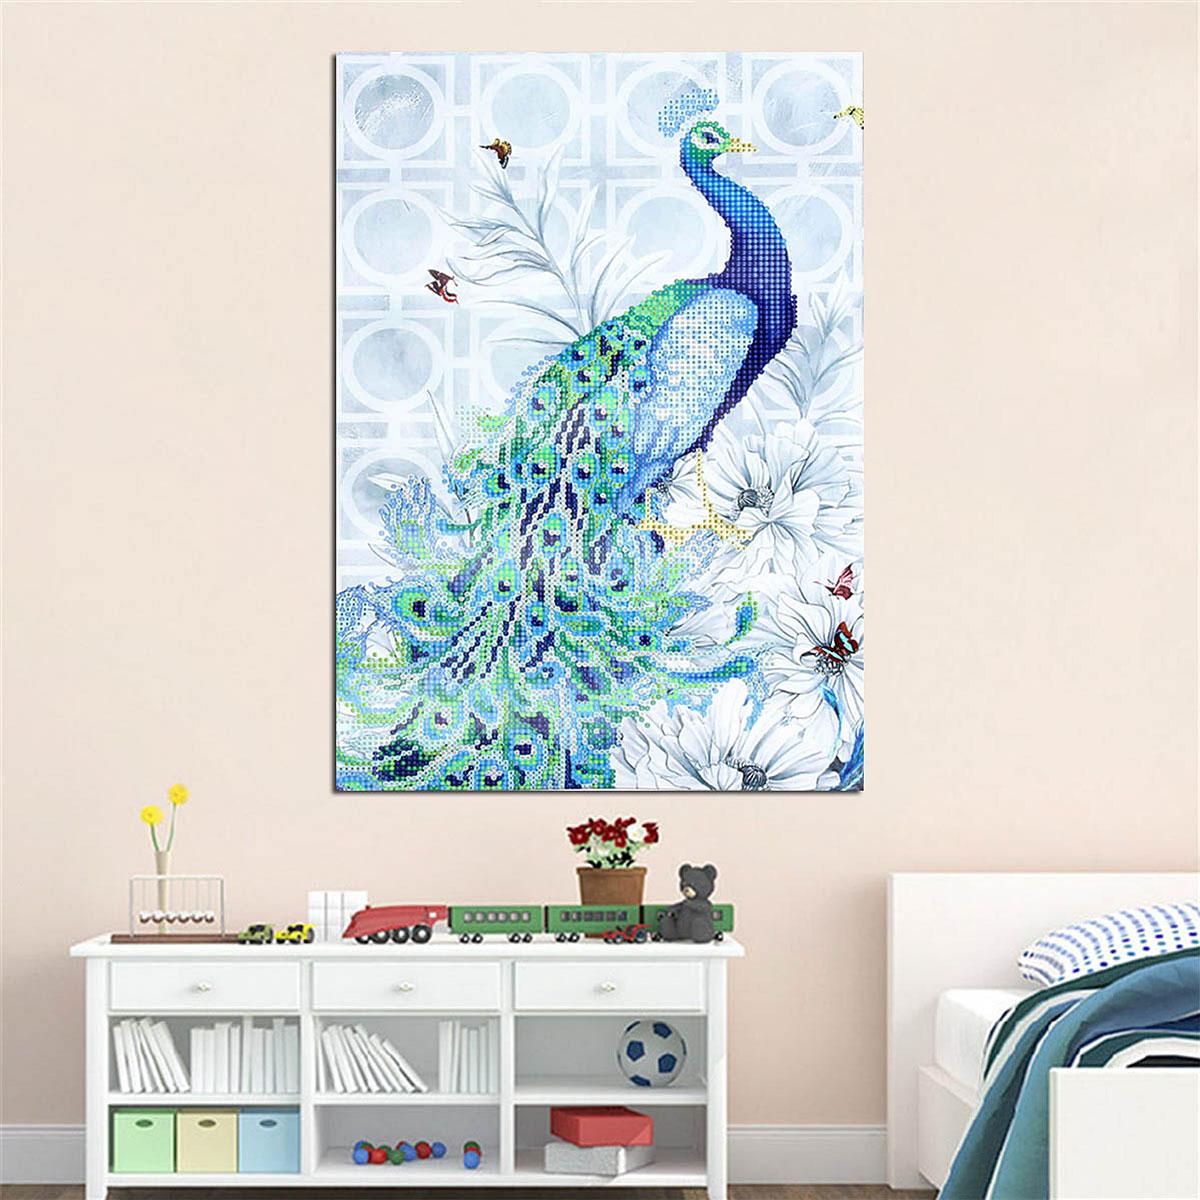 No Frame 5D Diamond Embroidery Painting DIY Blue Peacock Craft Home Decor